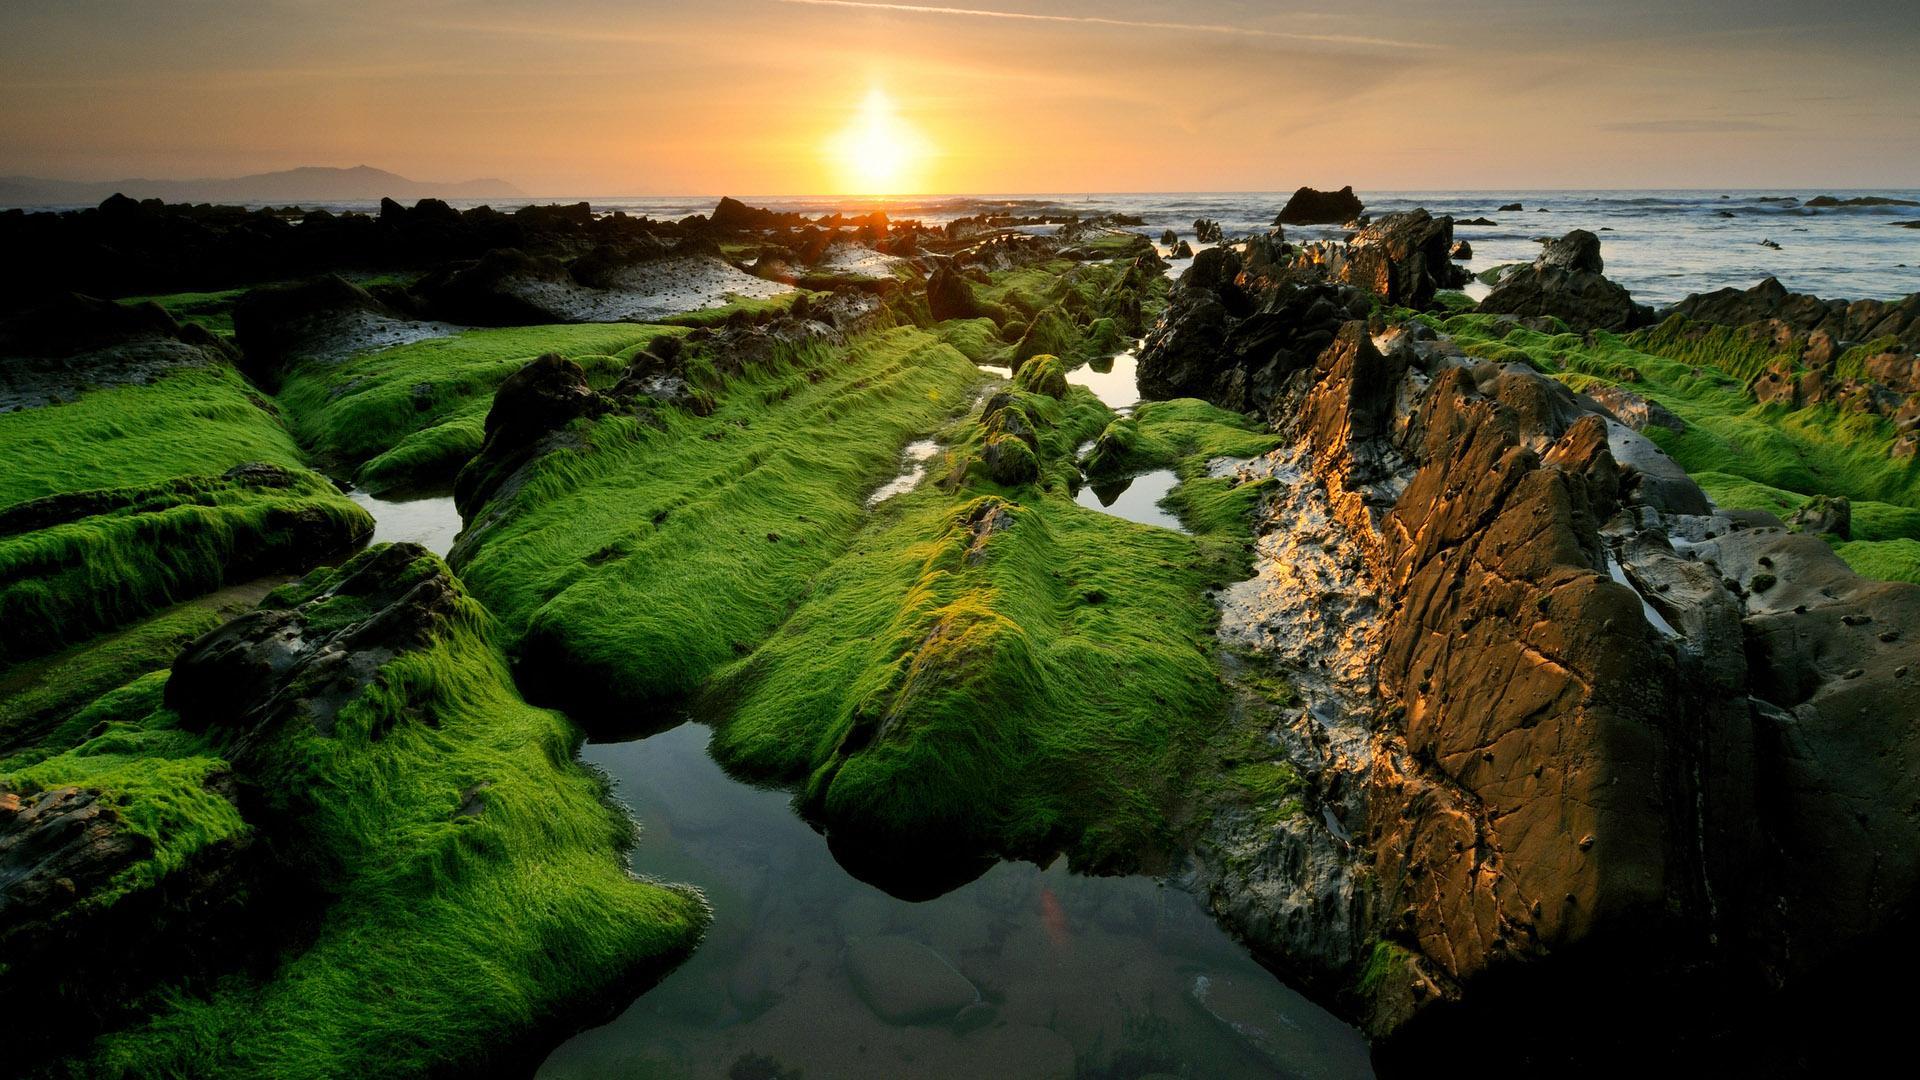 stunning shore wallpaper 46325